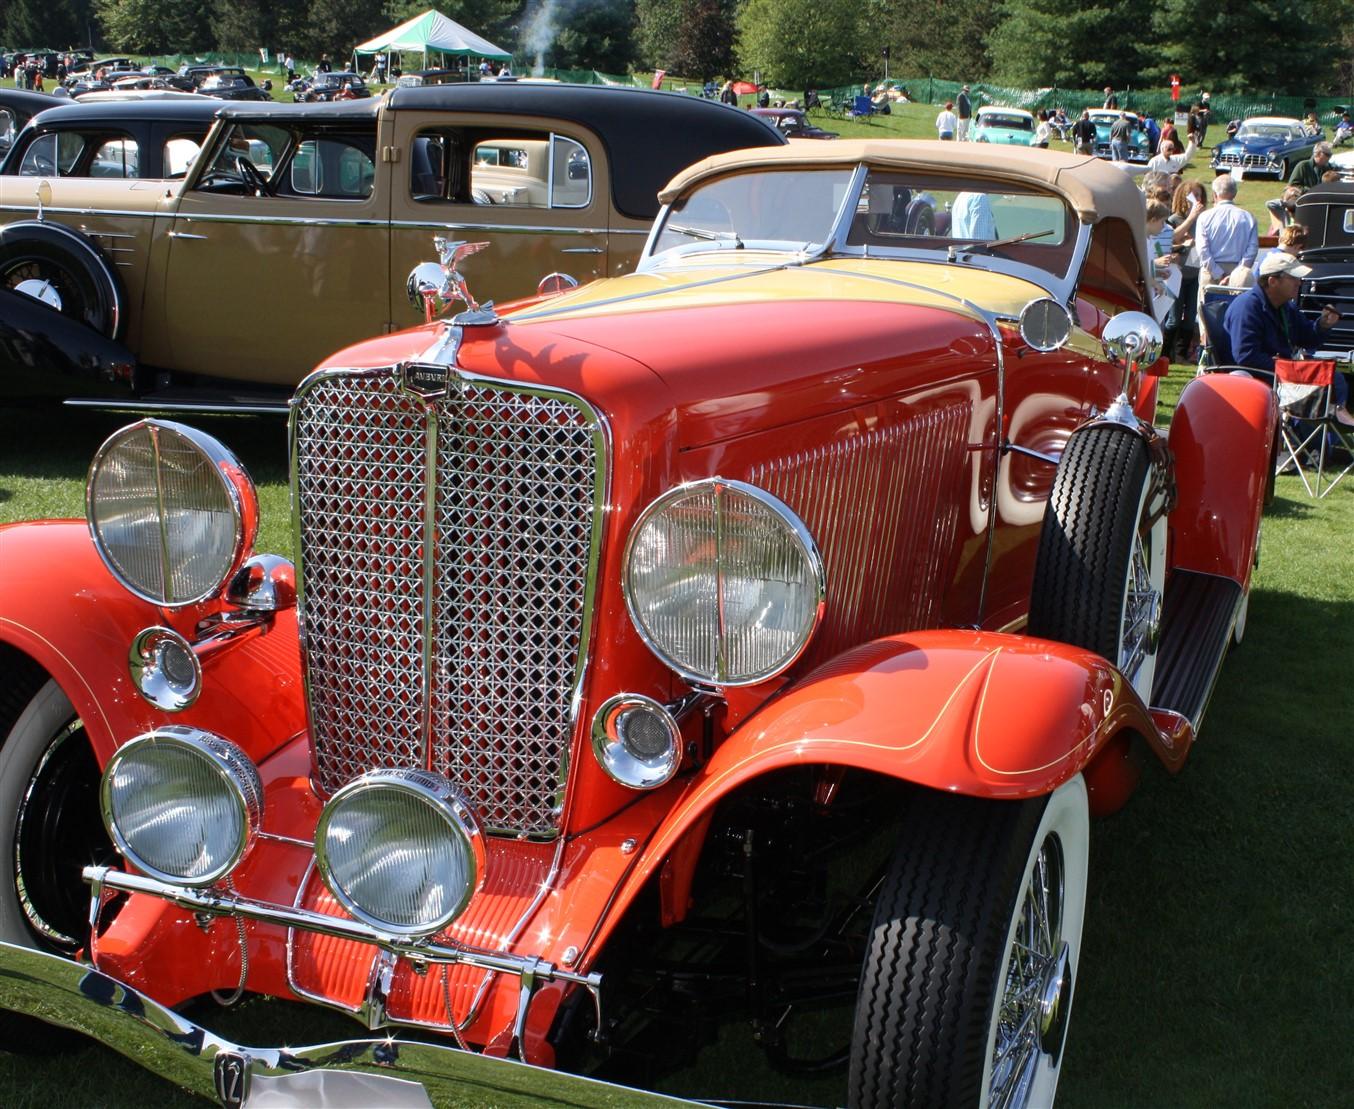 2011 09 18  Canton Glenmoor Concours 66.jpg